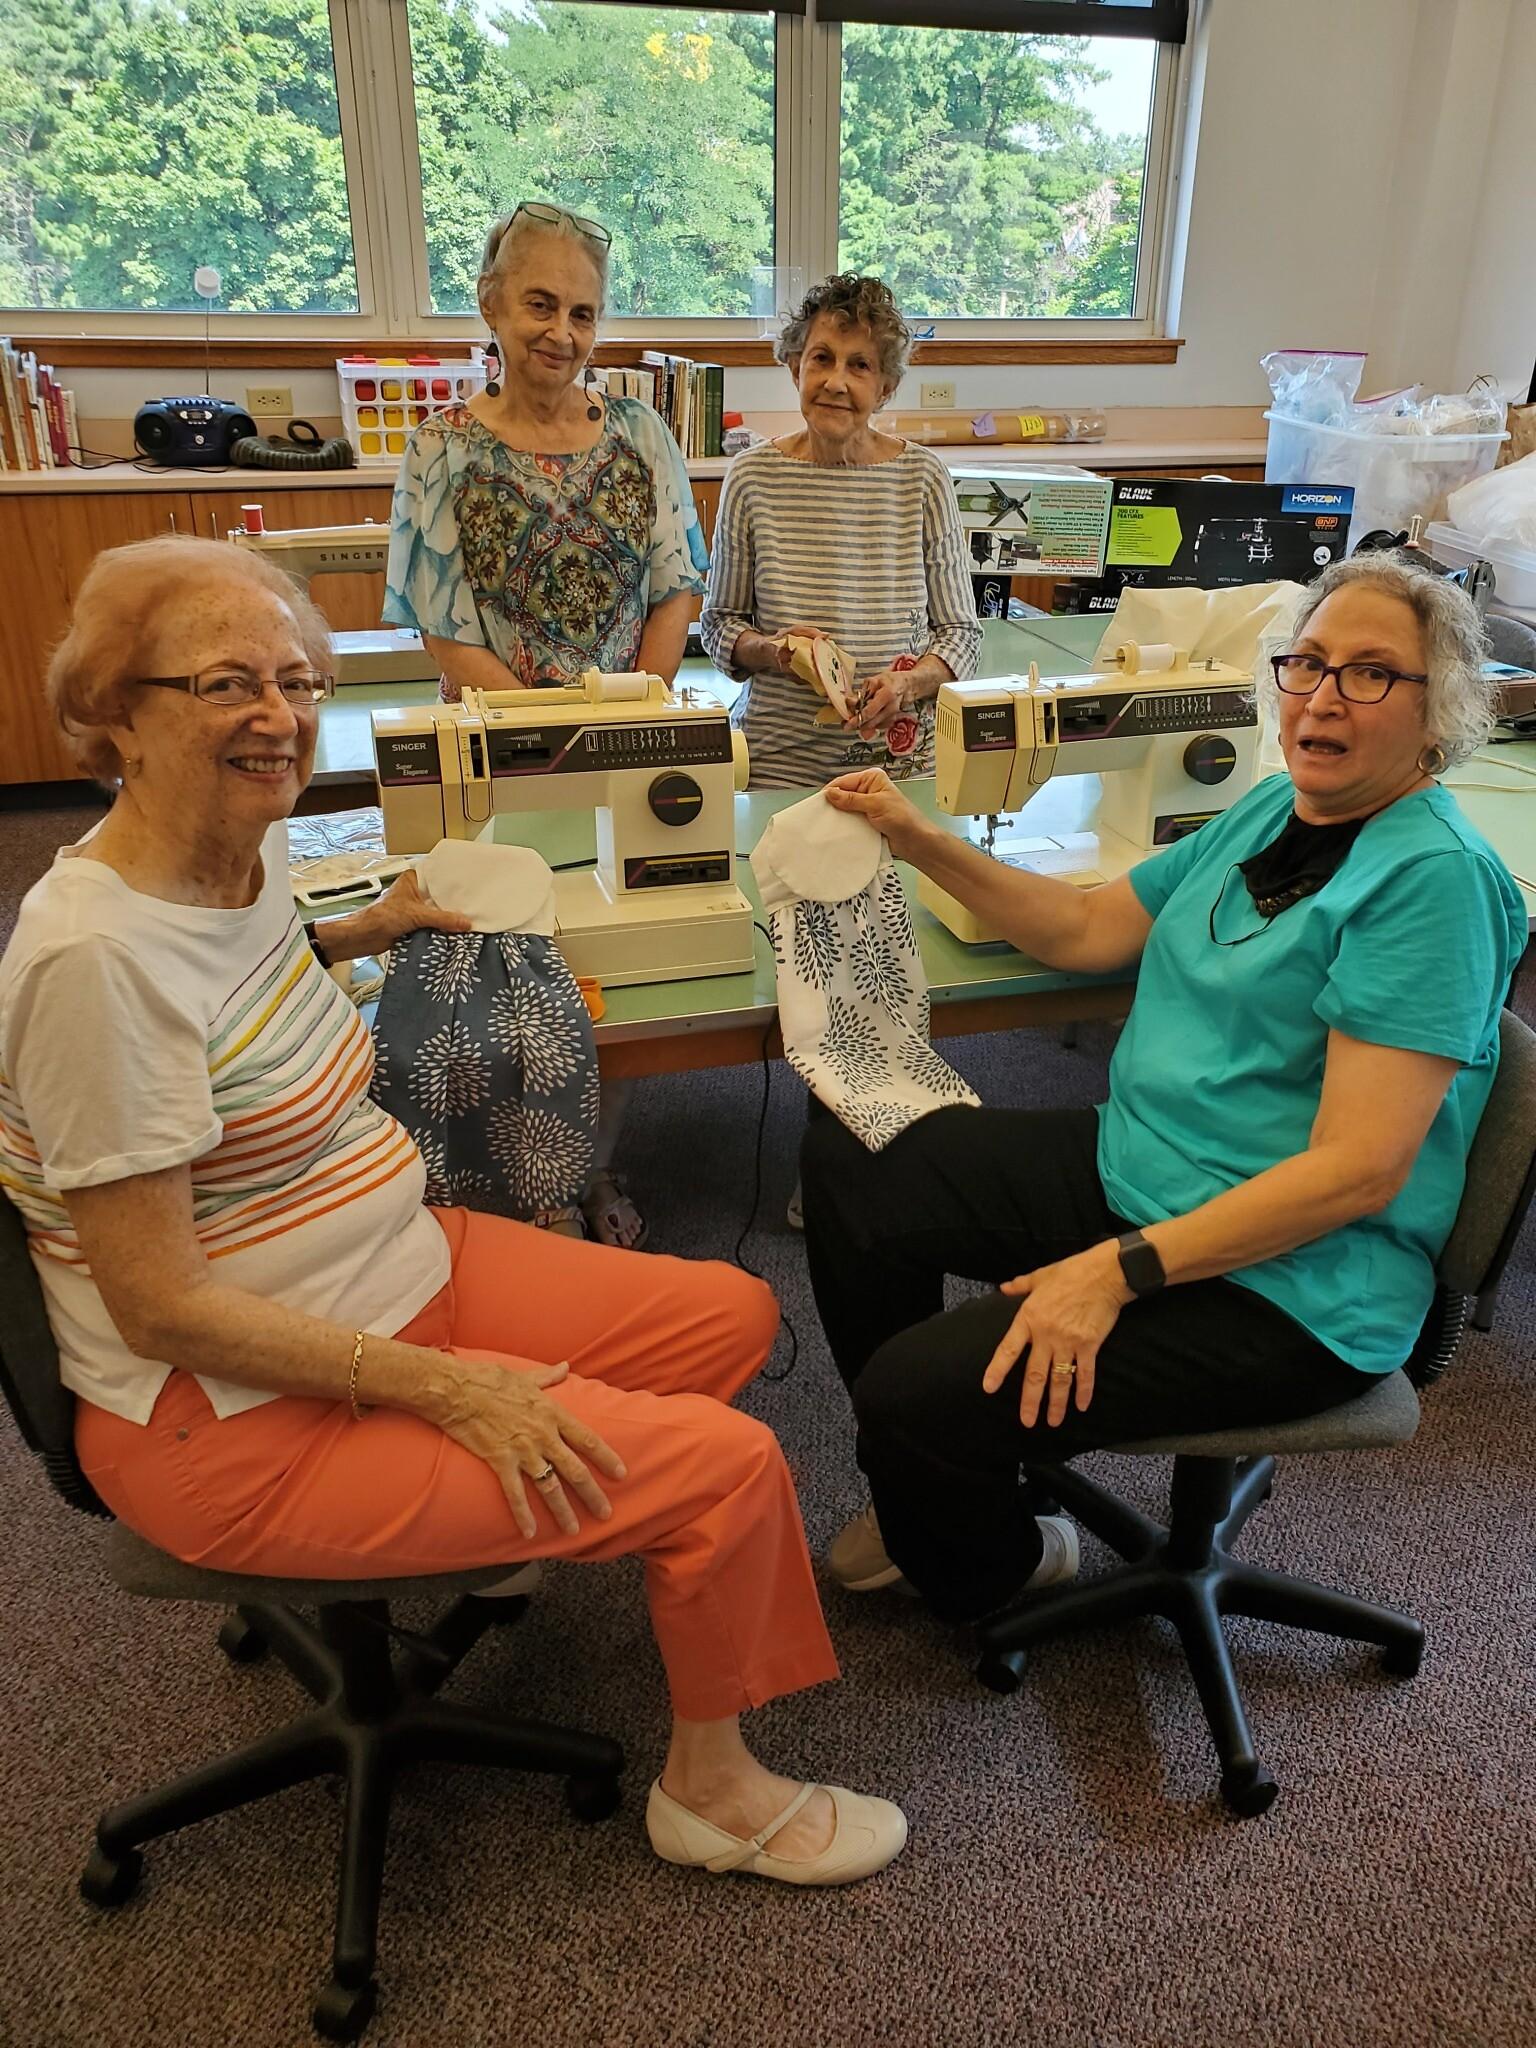 Left front row: Nancy Rosenthal and Susanne Gollin; Left back row: Caroline Liston and Phyllis Klein. Photo by Adam Reinherz